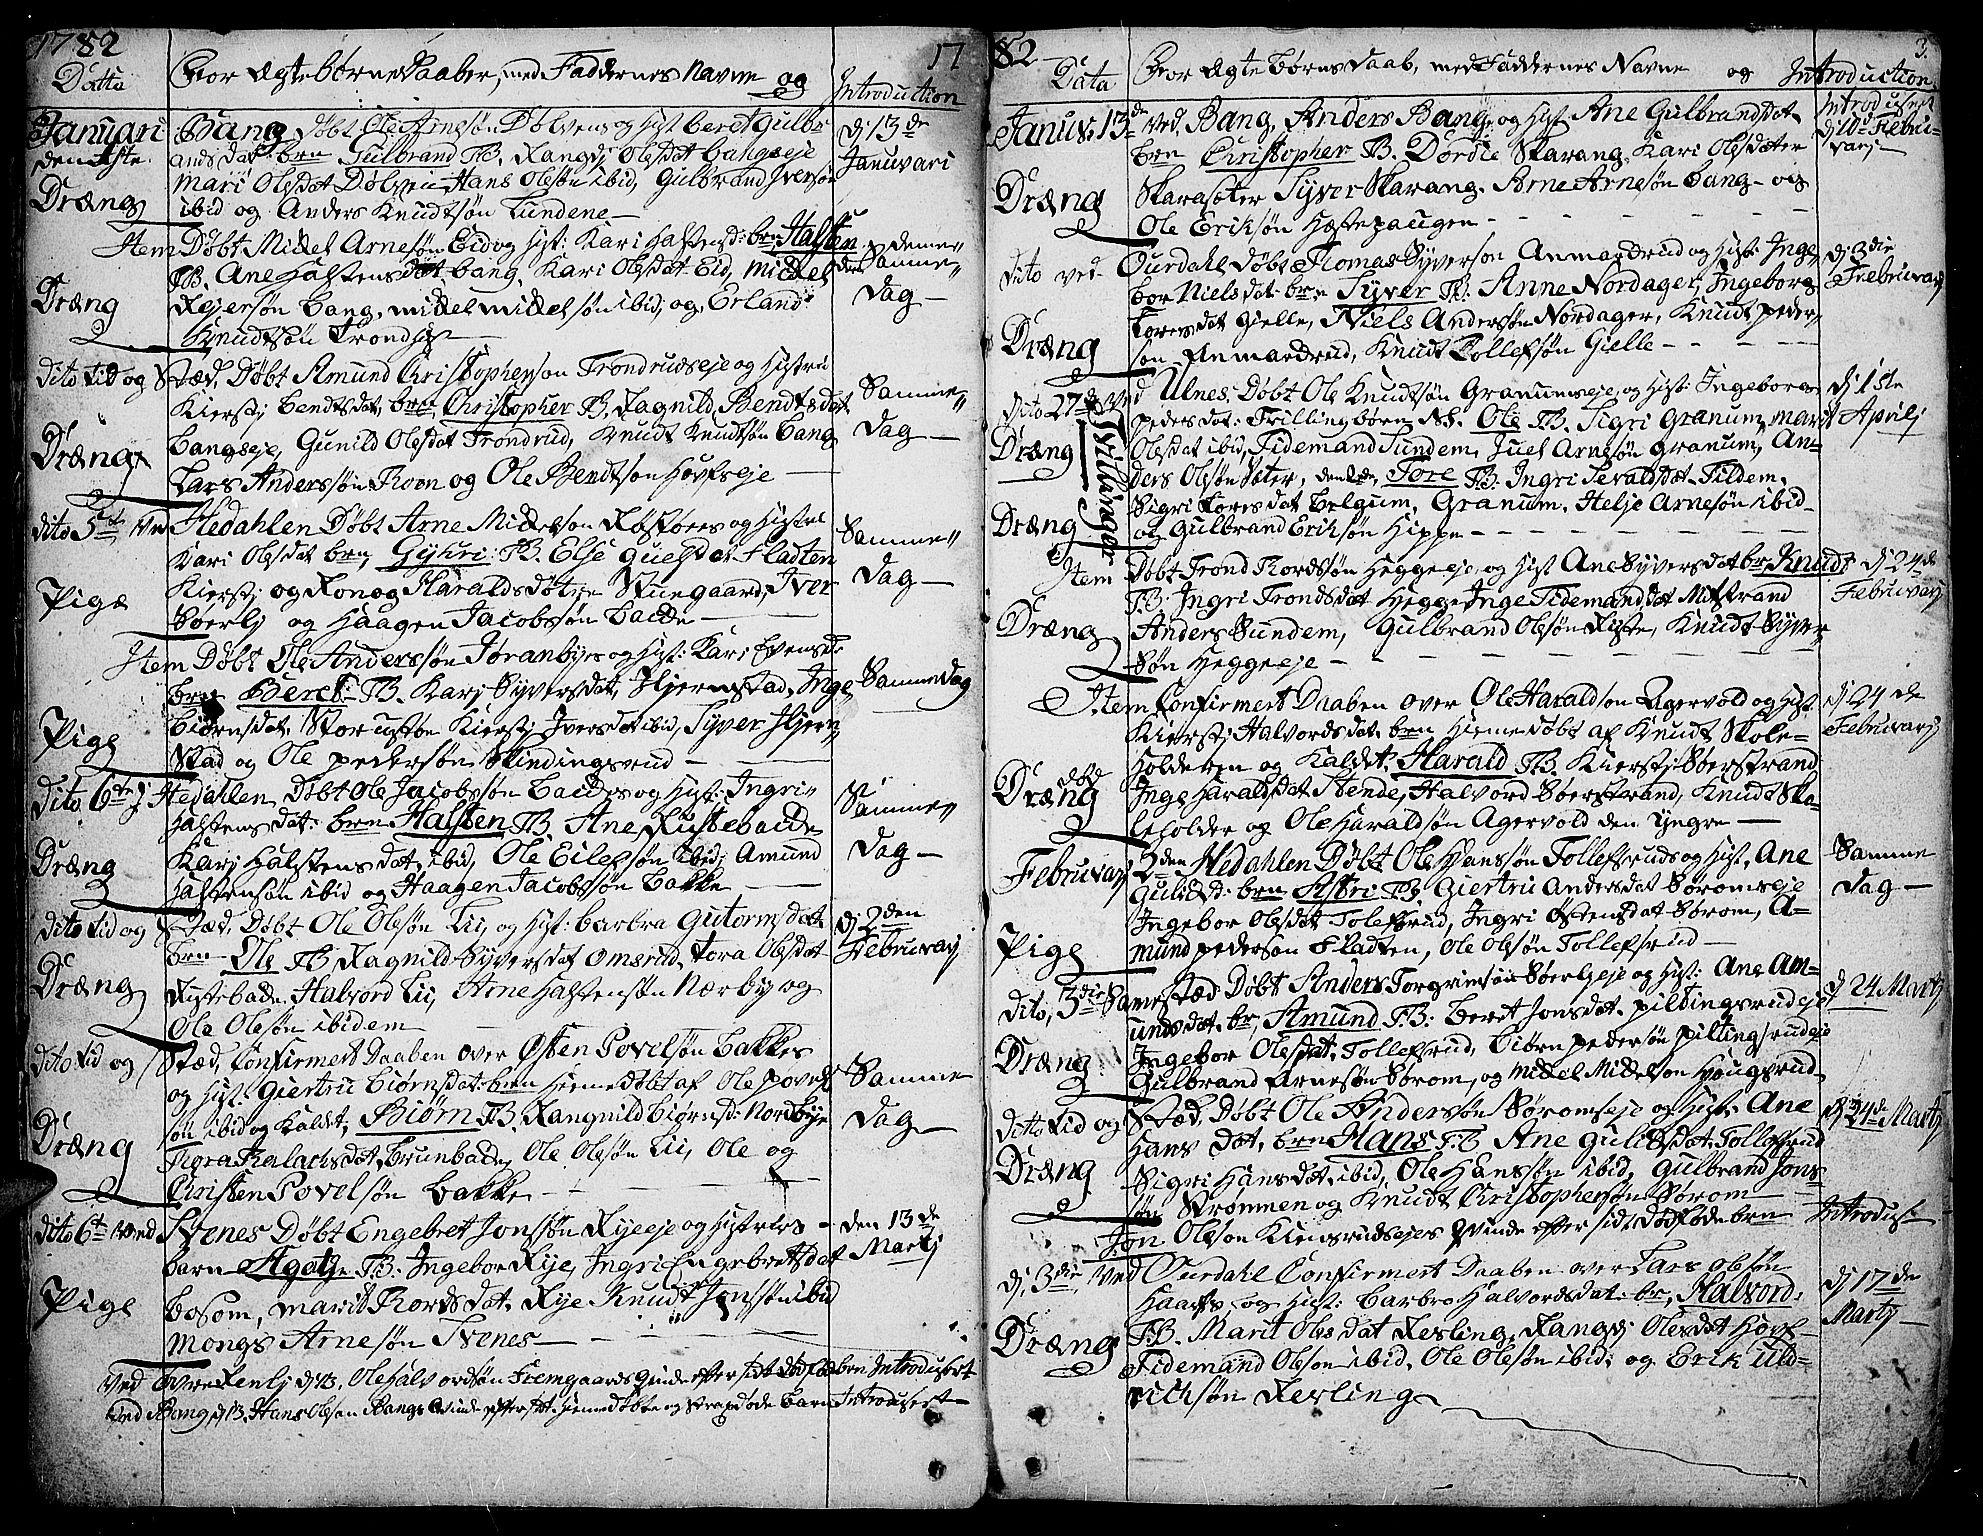 SAH, Aurdal prestekontor, Ministerialbok nr. 6, 1781-1804, s. 3